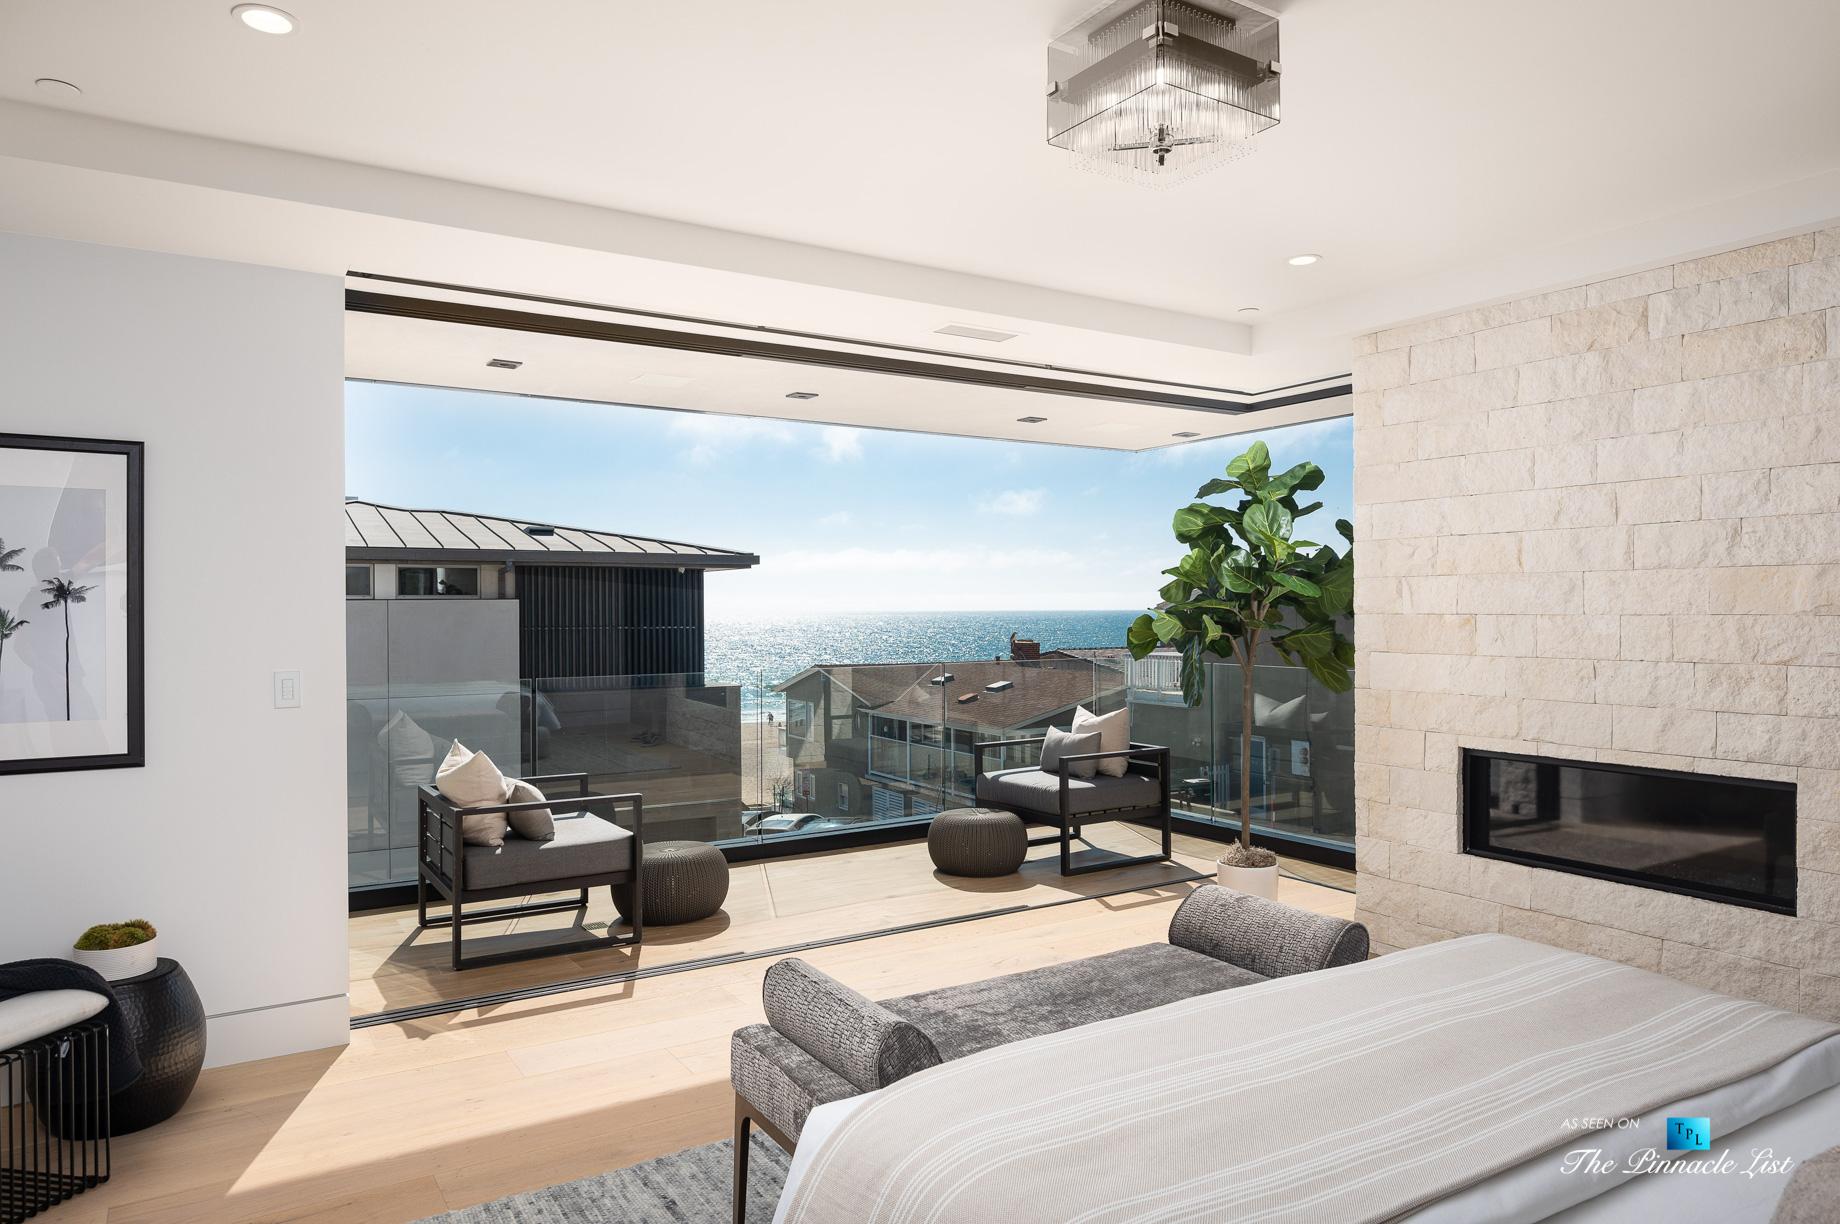 2016 Ocean Dr, Manhattan Beach, CA, USA – Master Bedroom – Luxury Real Estate – Modern Ocean View Home